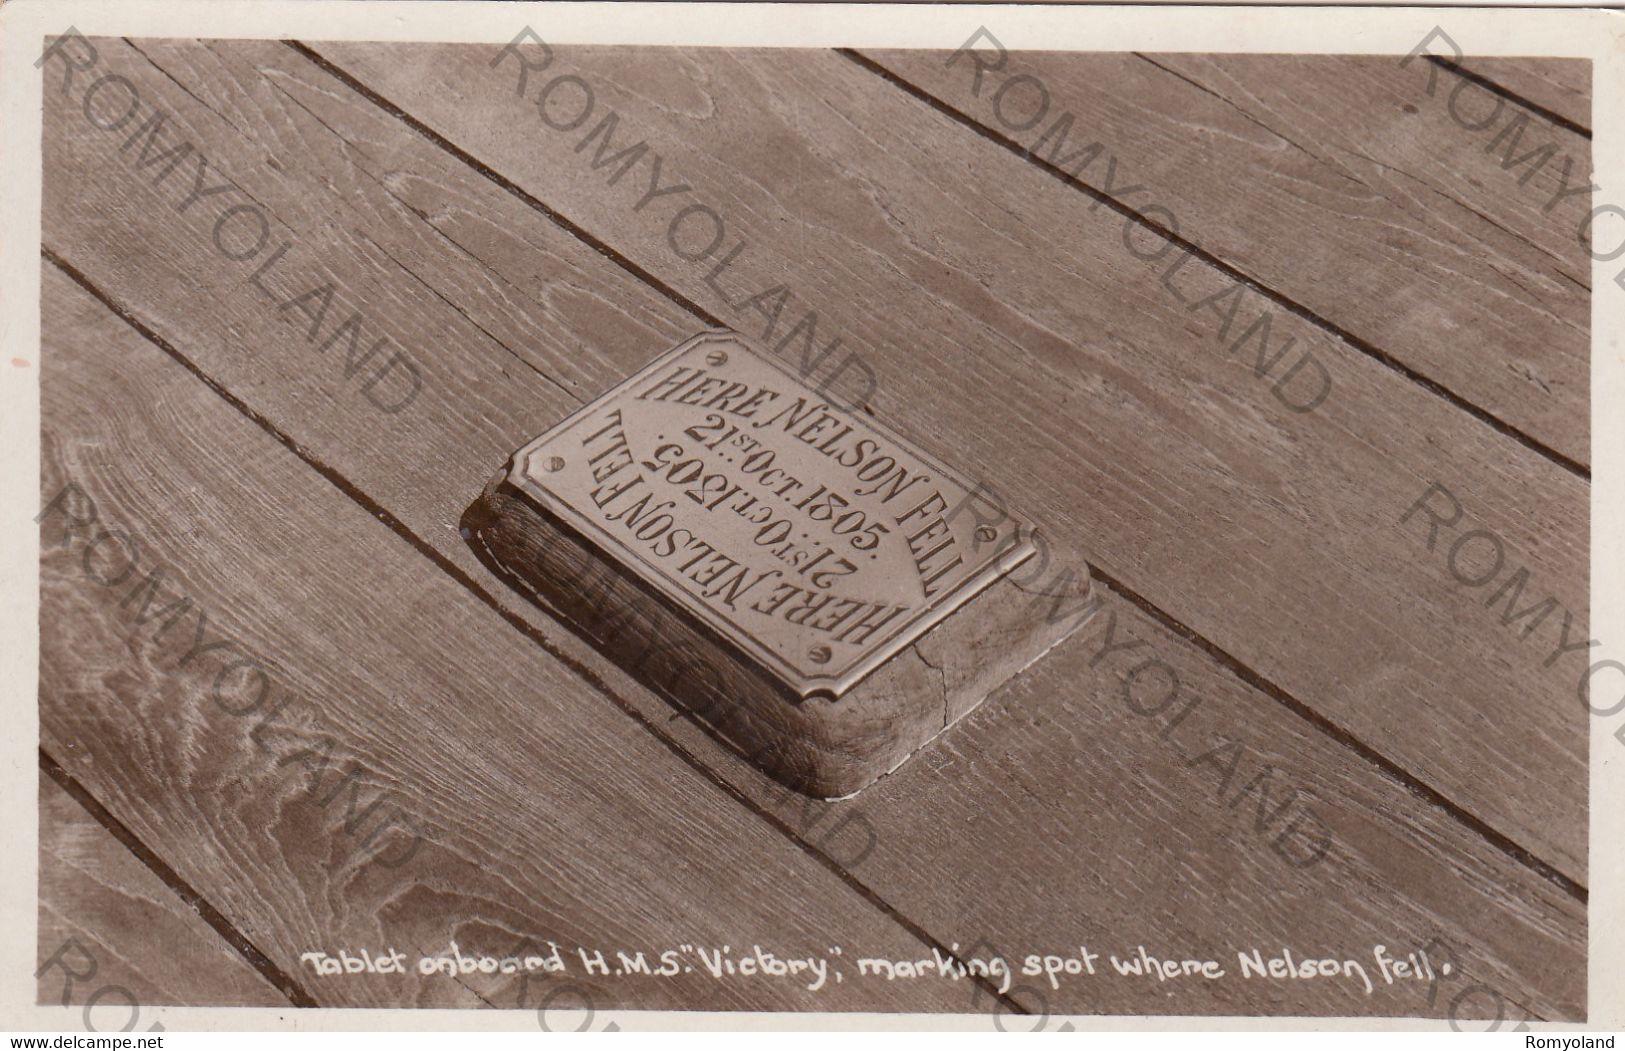 "CARTOLINA   TABLET ONBOARD H.M.S.""VICTORY"",MARKING SPOT WHERE NELSON FELL,NON VIAGGIATA - Wereld"